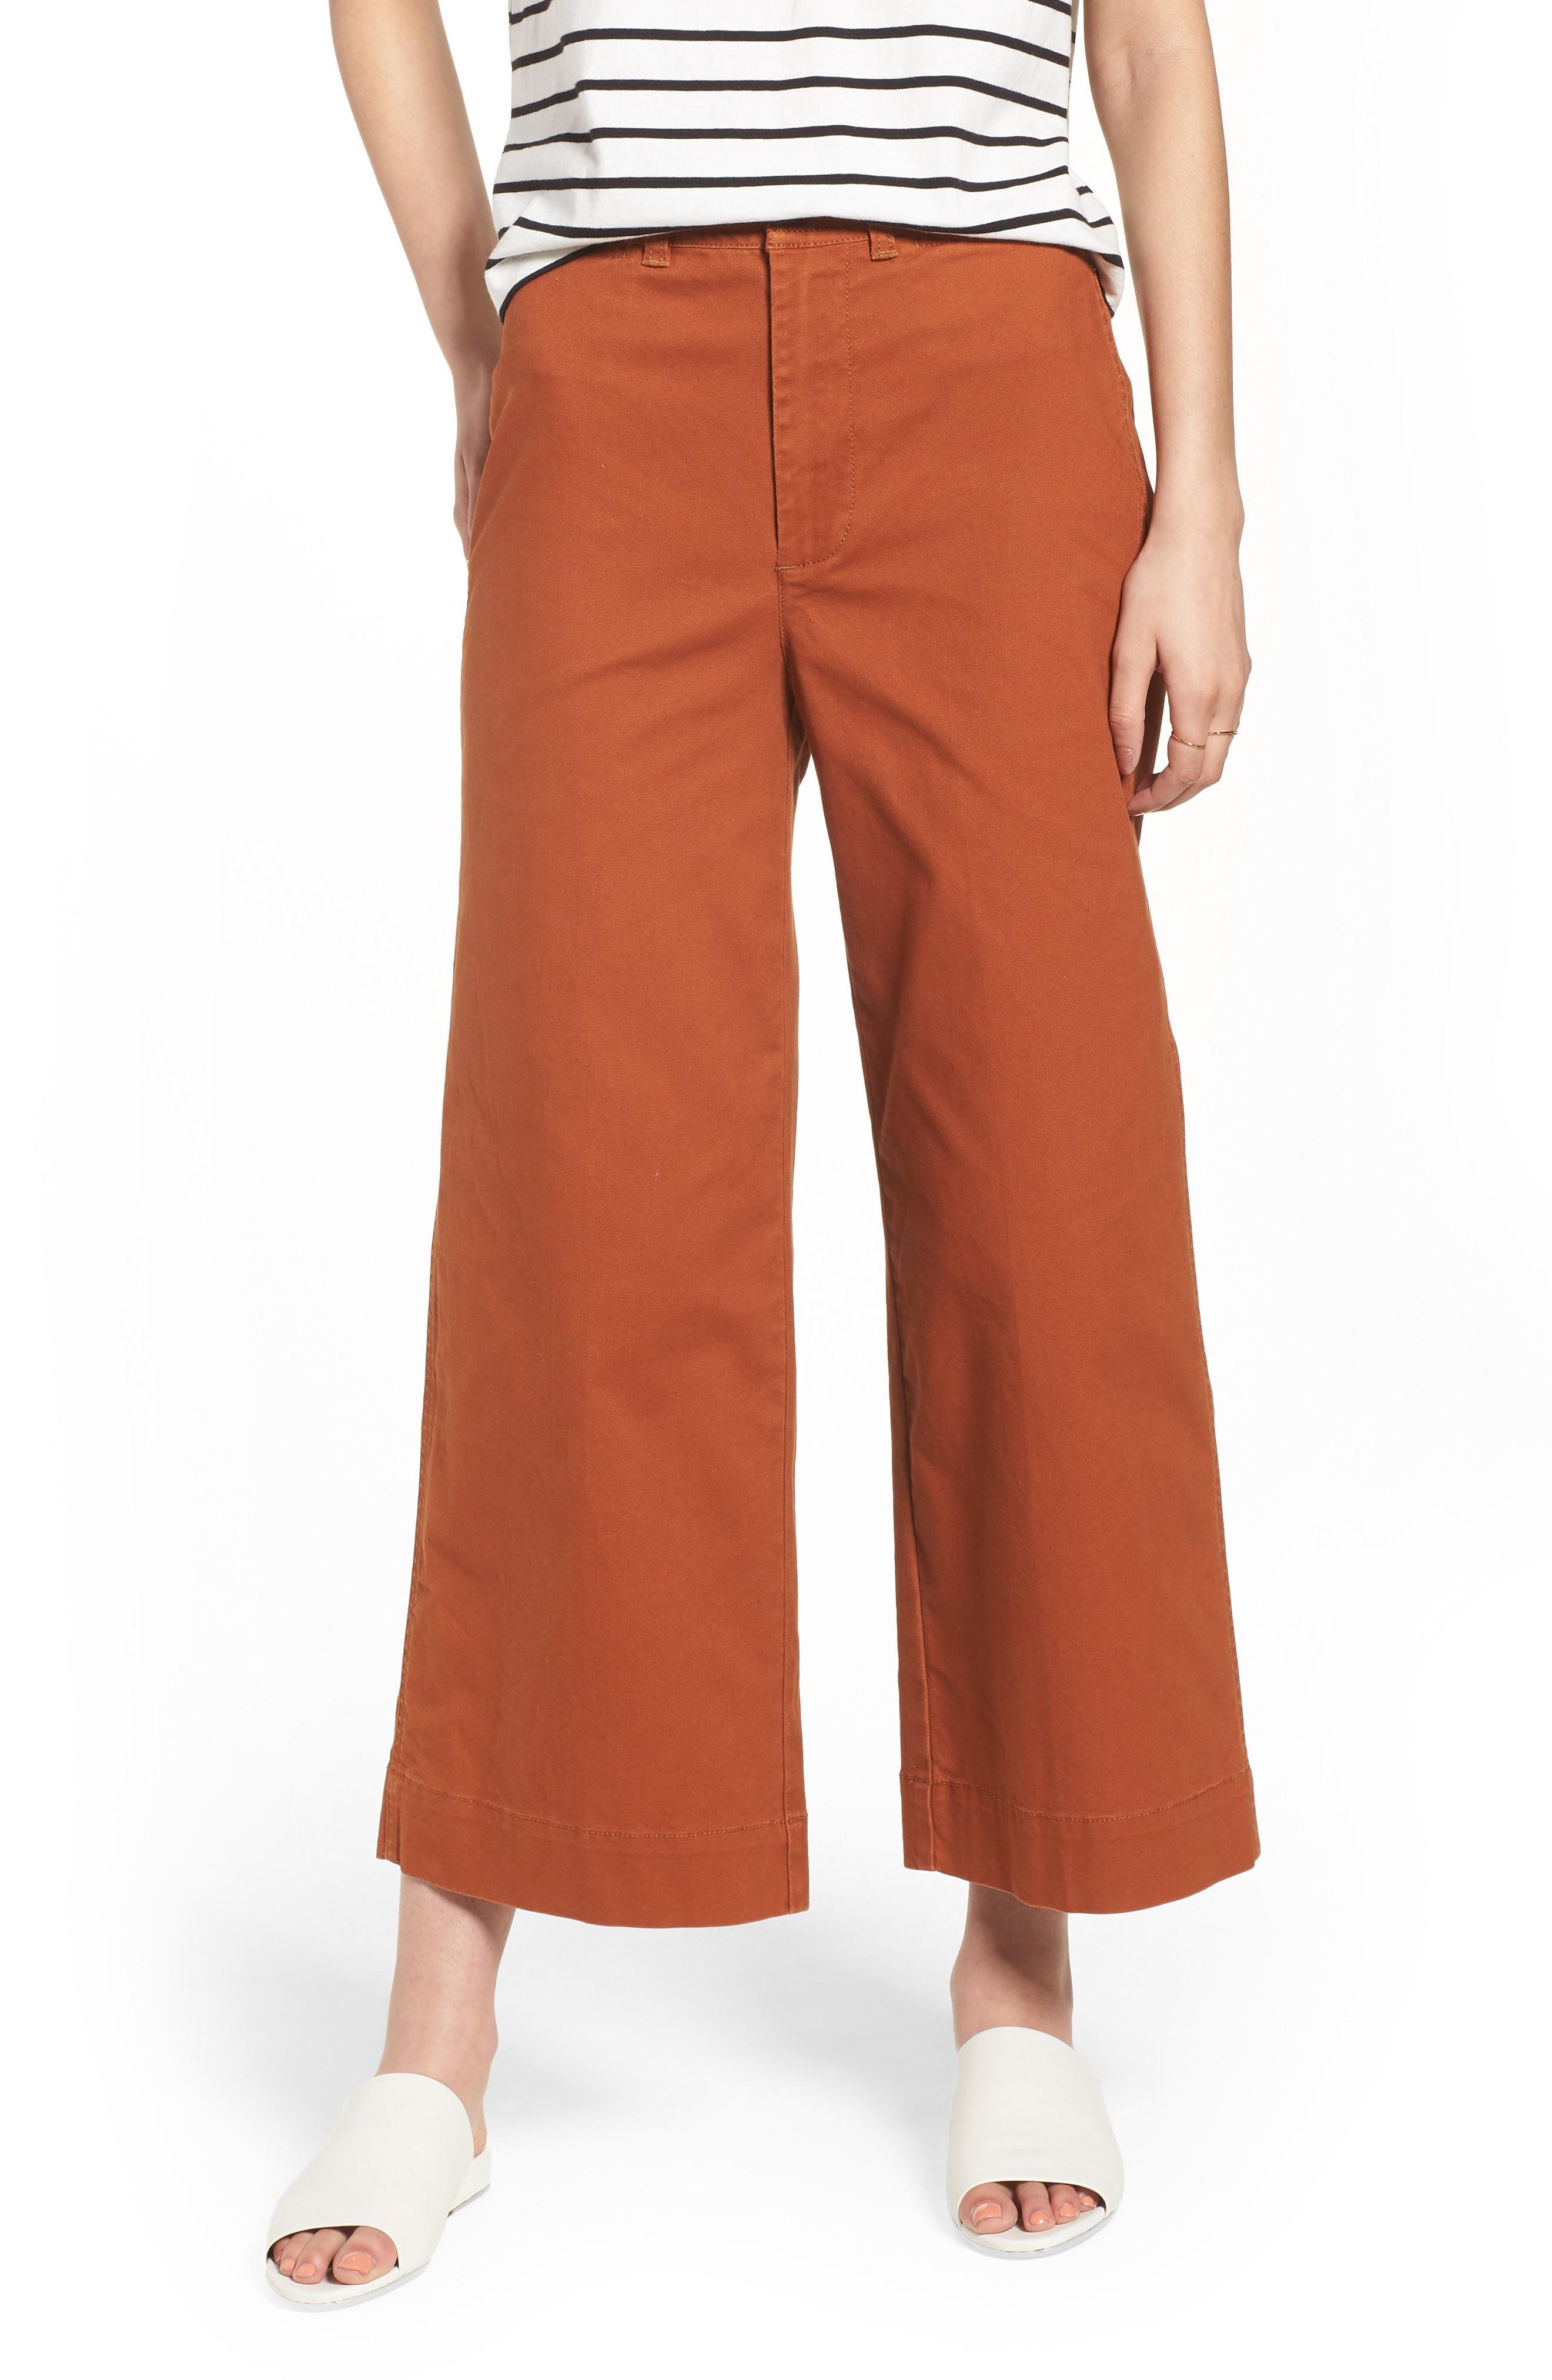 575d48ad5 Madewell Emmett Crop Wide Leg Pants In Warm Nutmeg | ModeSens